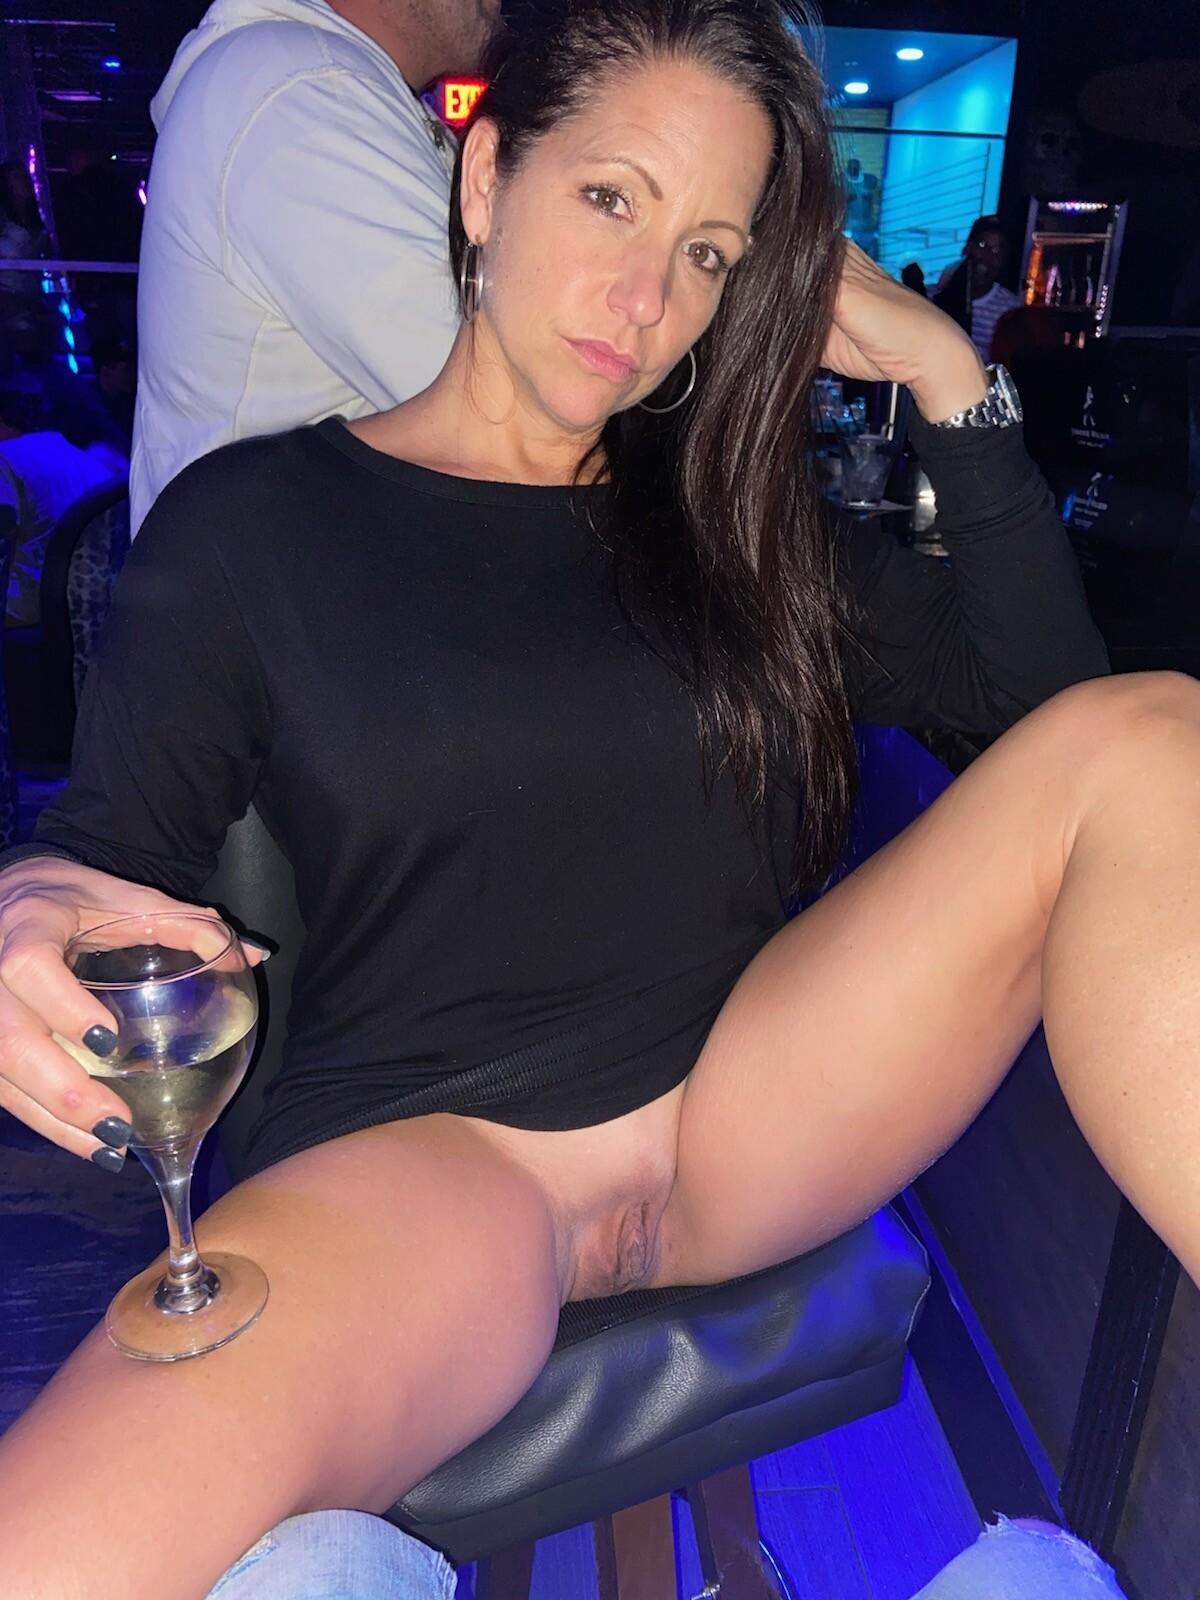 Pussy upskirt pics